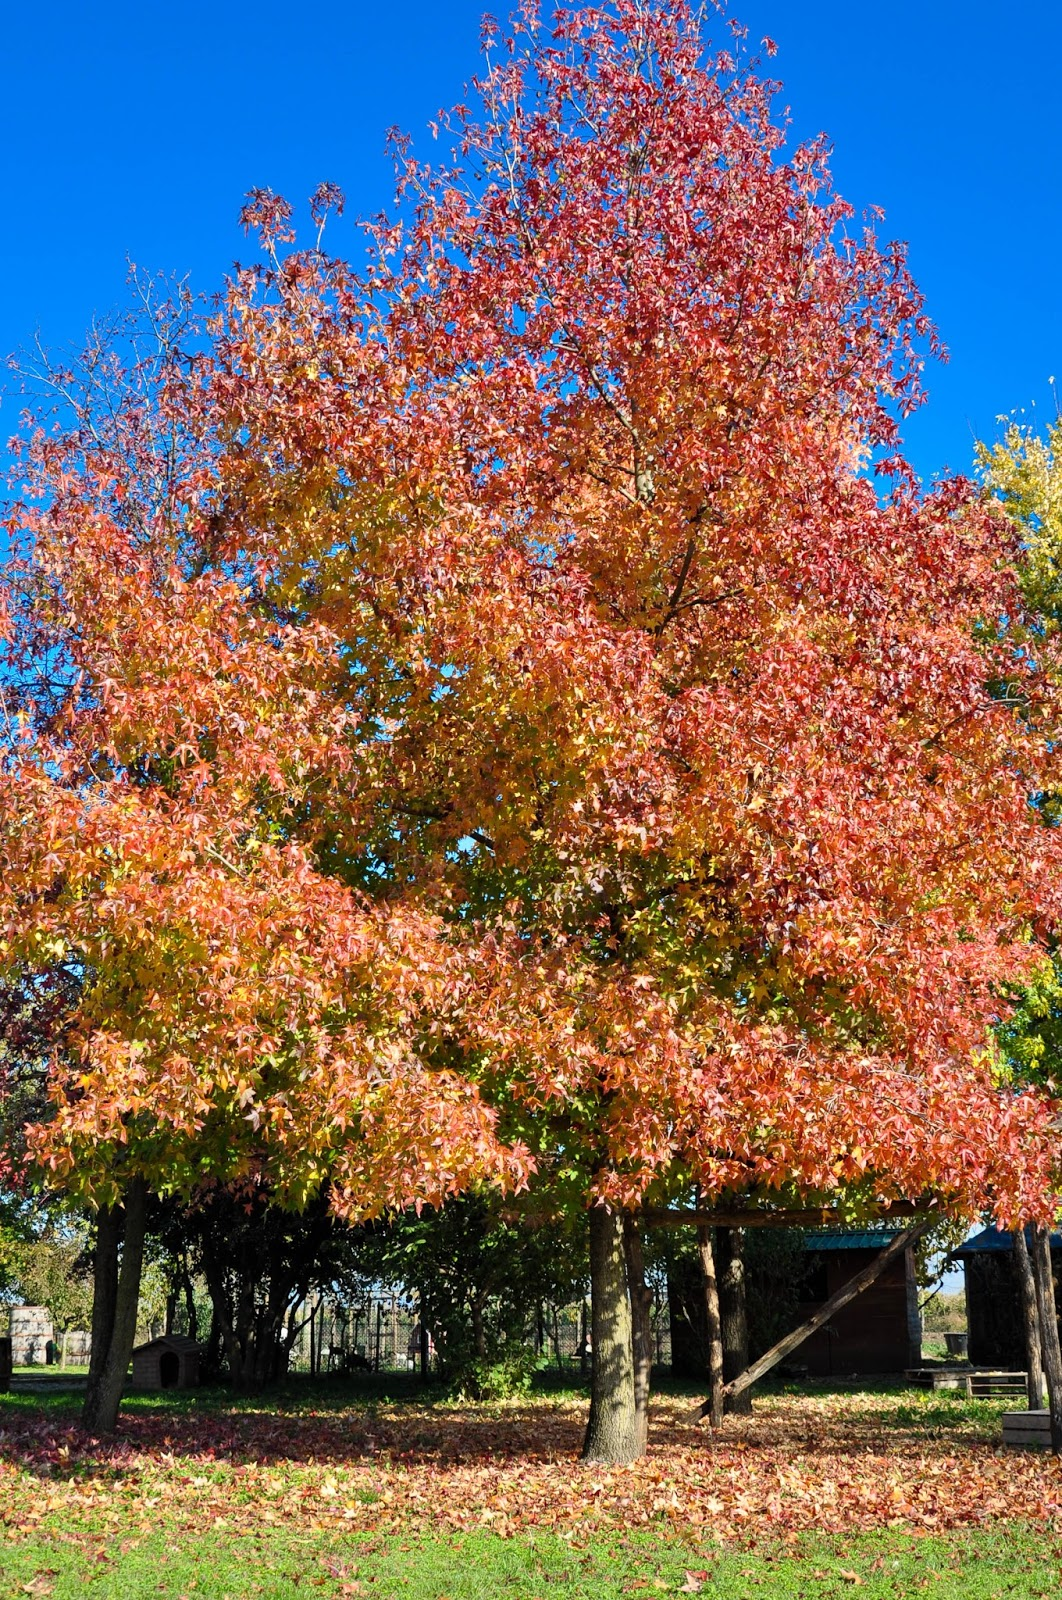 Atumnal tree, Agriturismo La Borina, Veneto, Italy